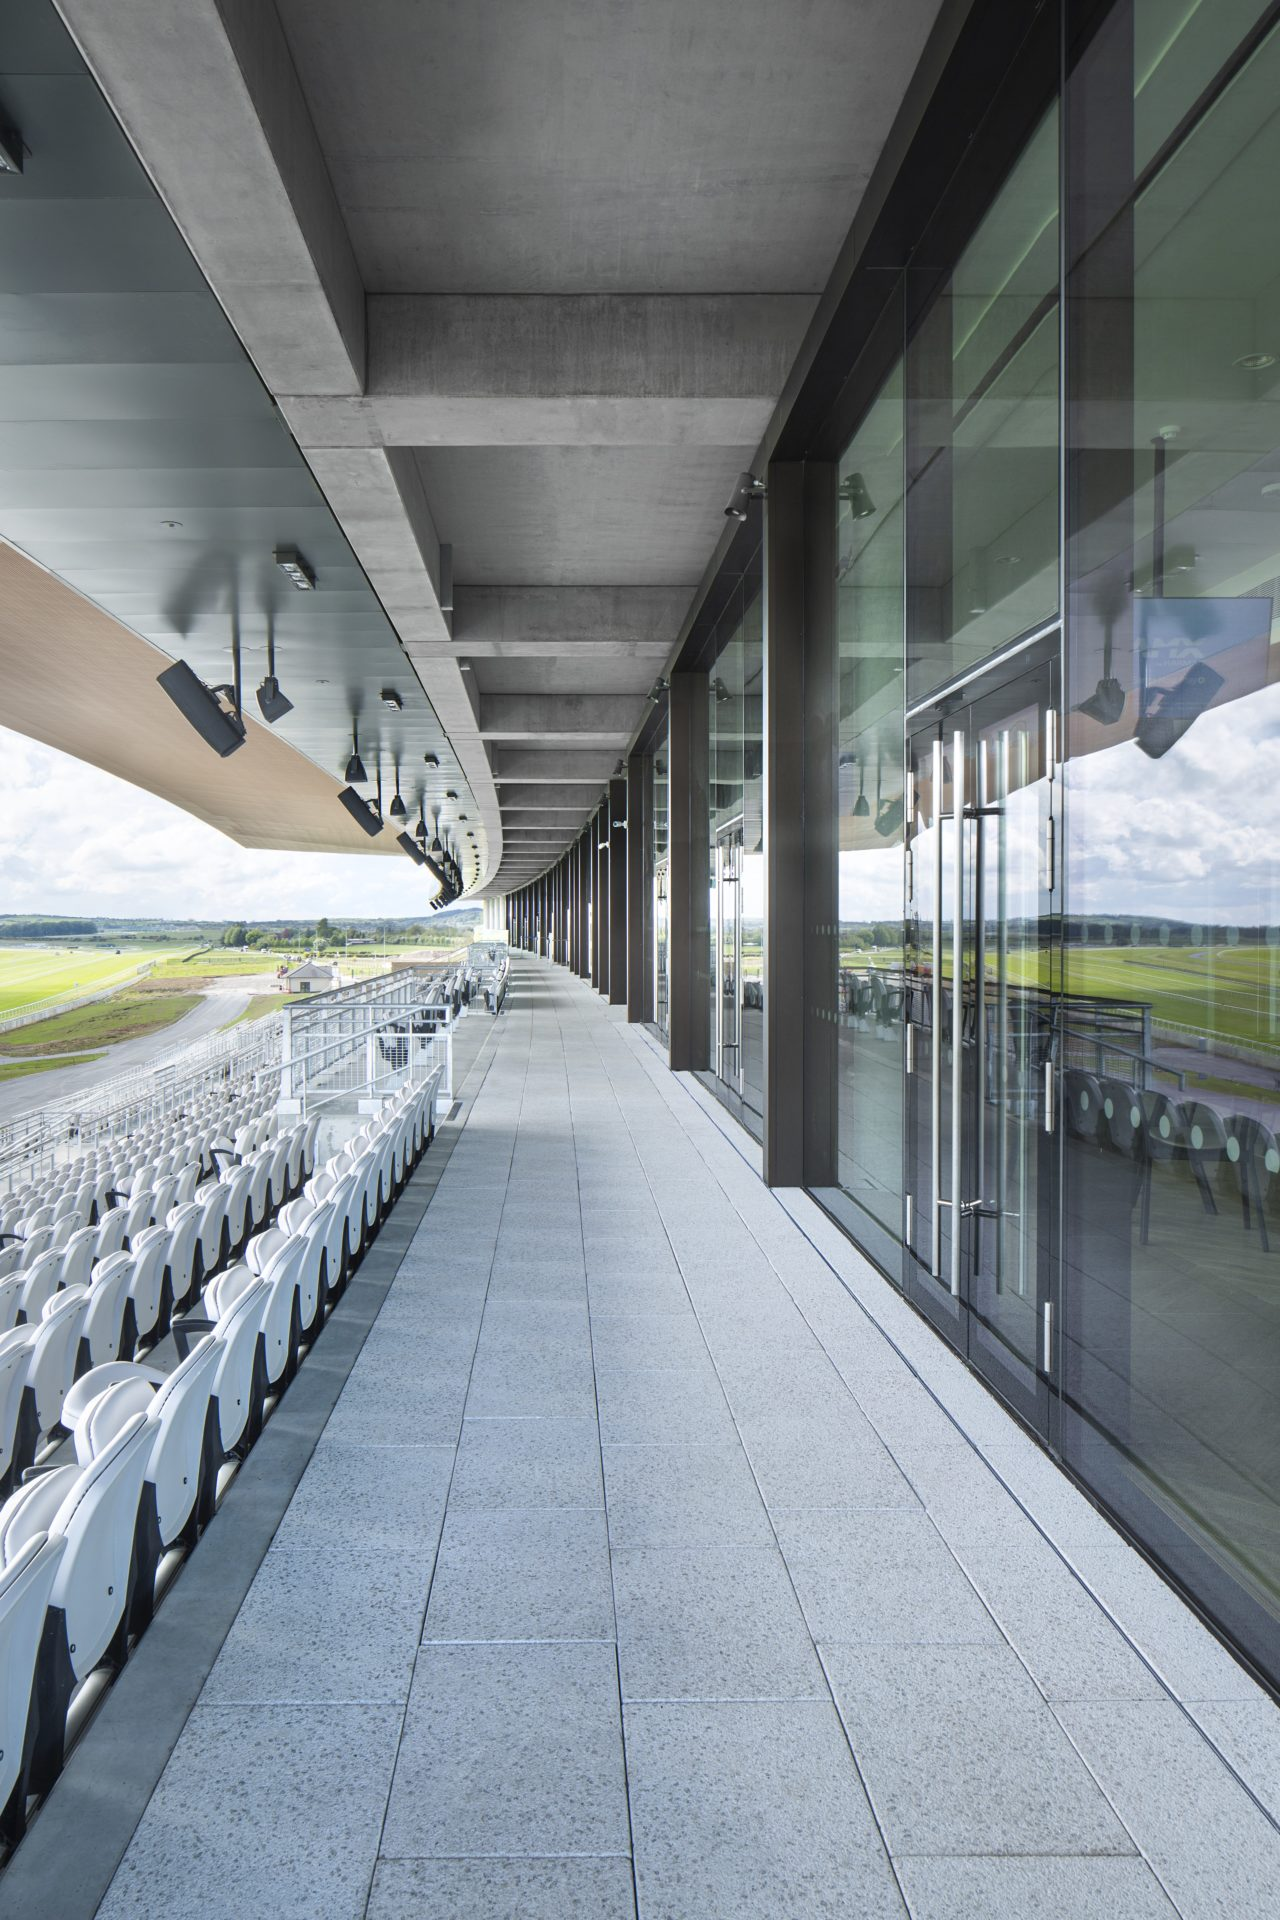 Curragh Racecourse, Co. Kildare featured image